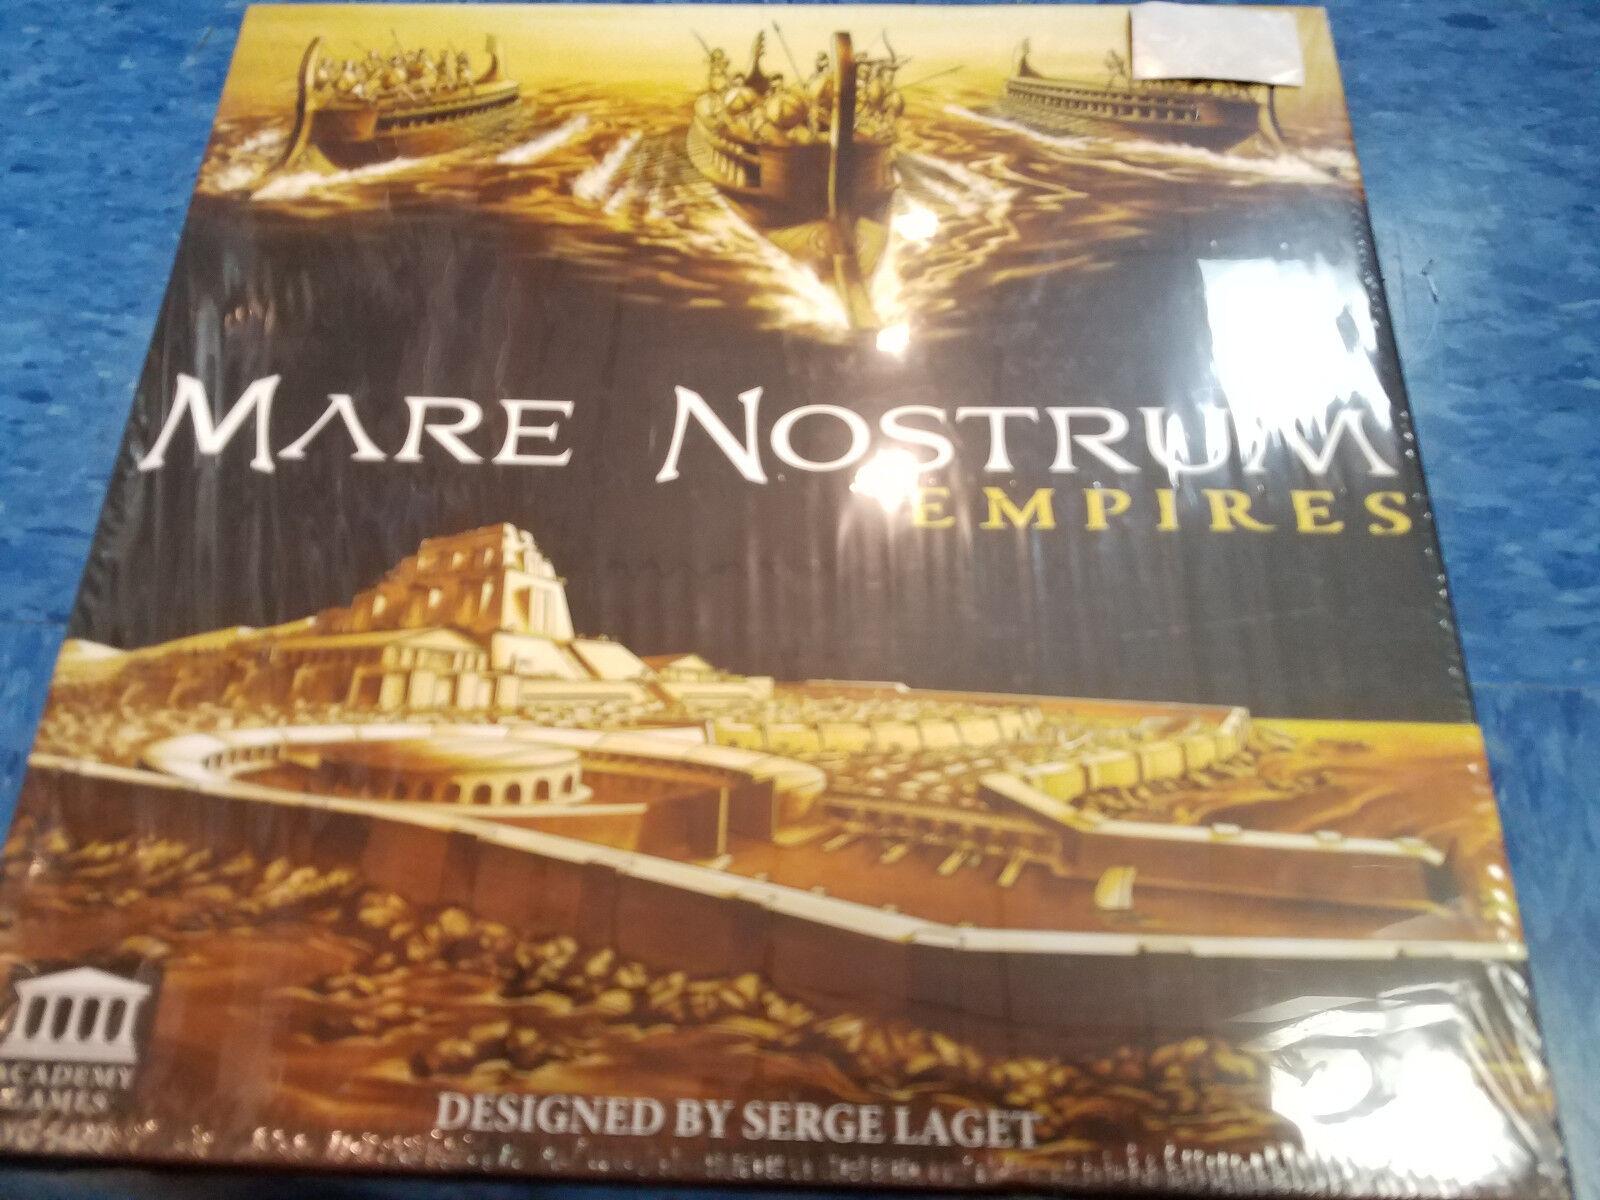 Mare Nostrum: Empires - Academy Games Board Game New